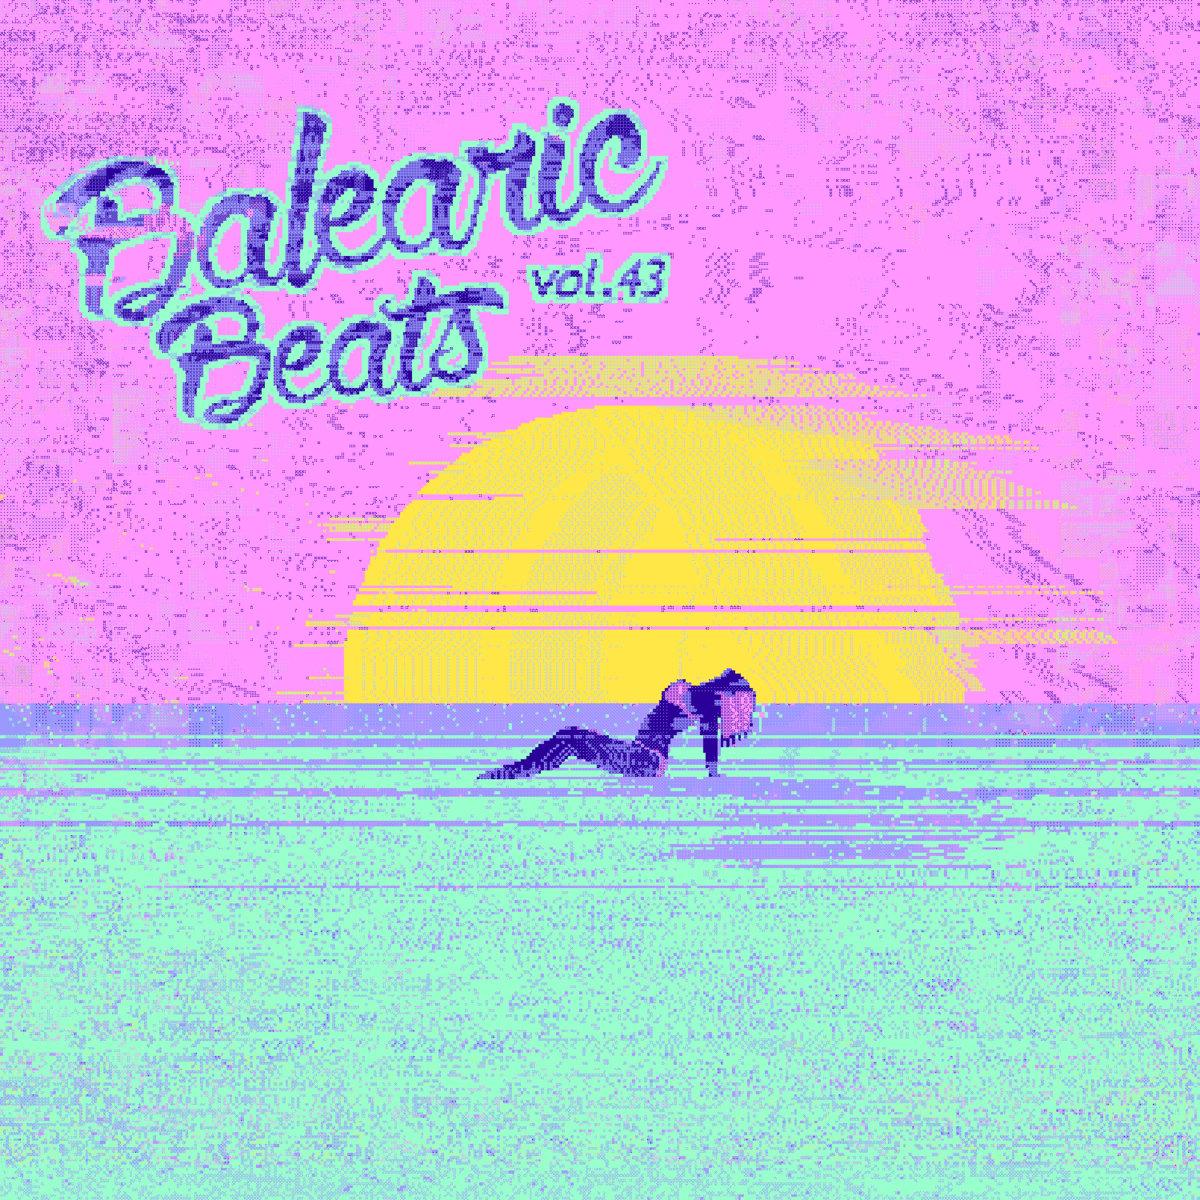 V/A: Balearic Beats vol. 43